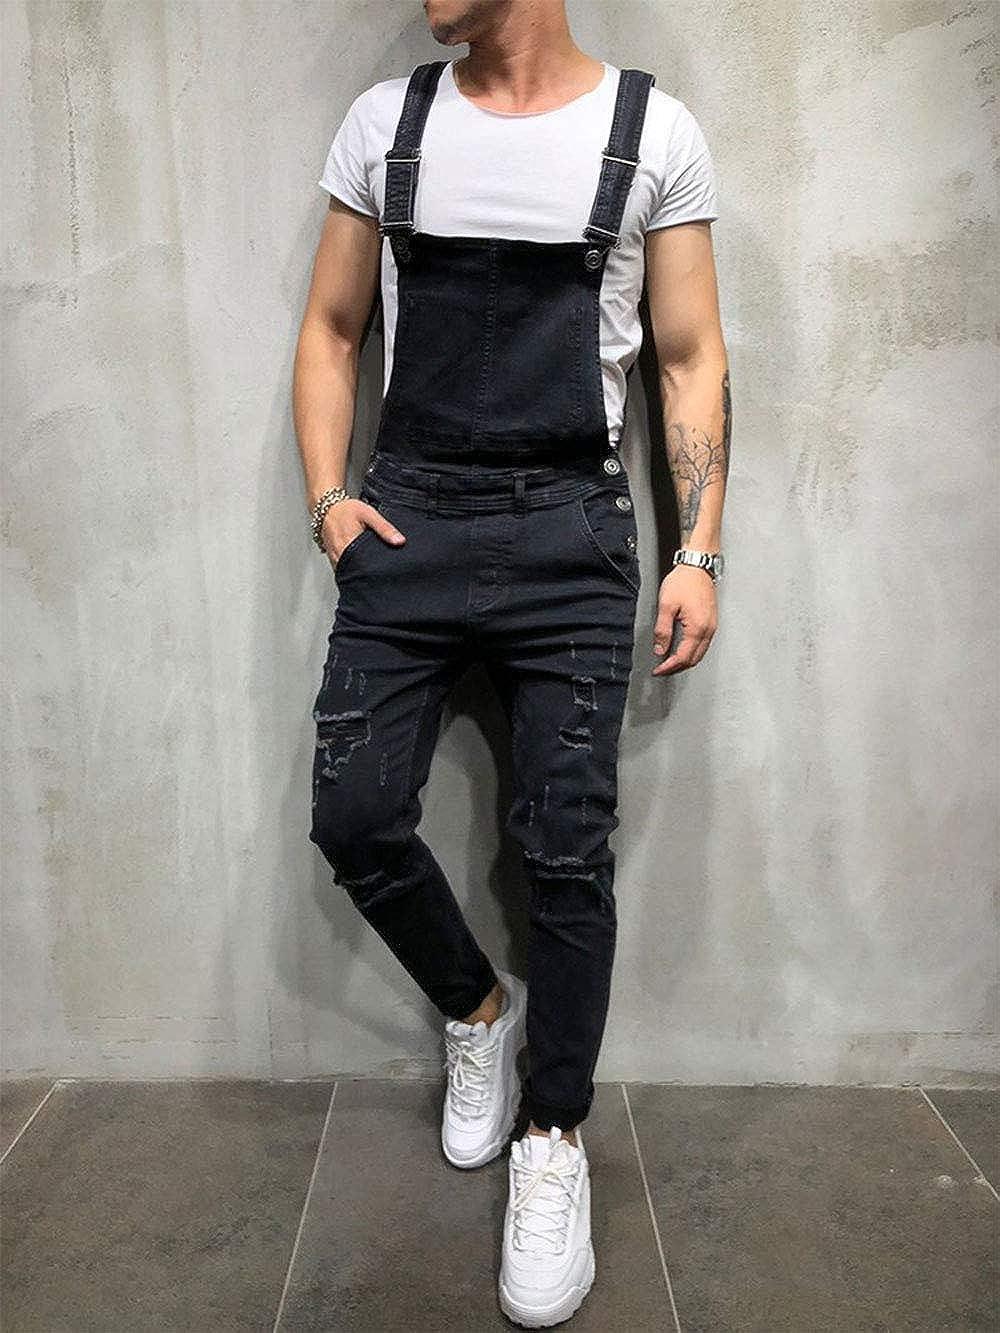 EVEDESIGN Mens Casual Ripped Denim Bib Overalls Fashion Slim Fit Washend Jean Jumpsuit